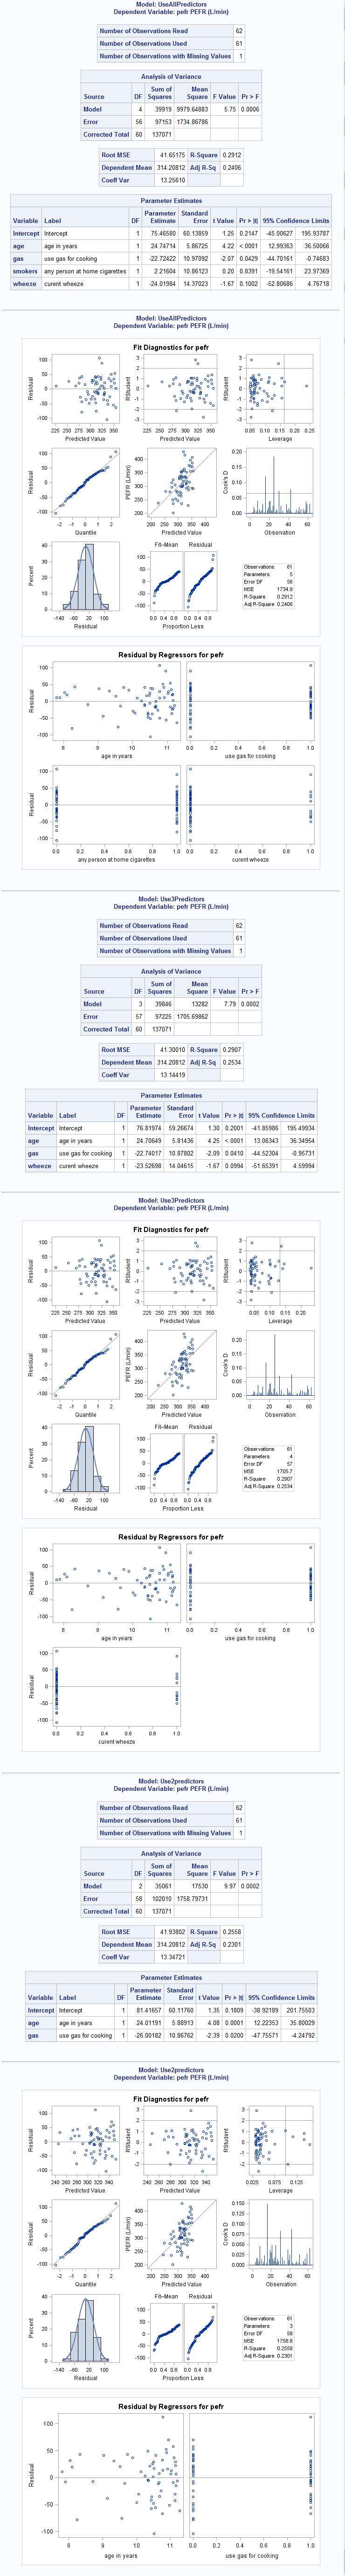 Chapter 10: Multifactorial analyses using SAS